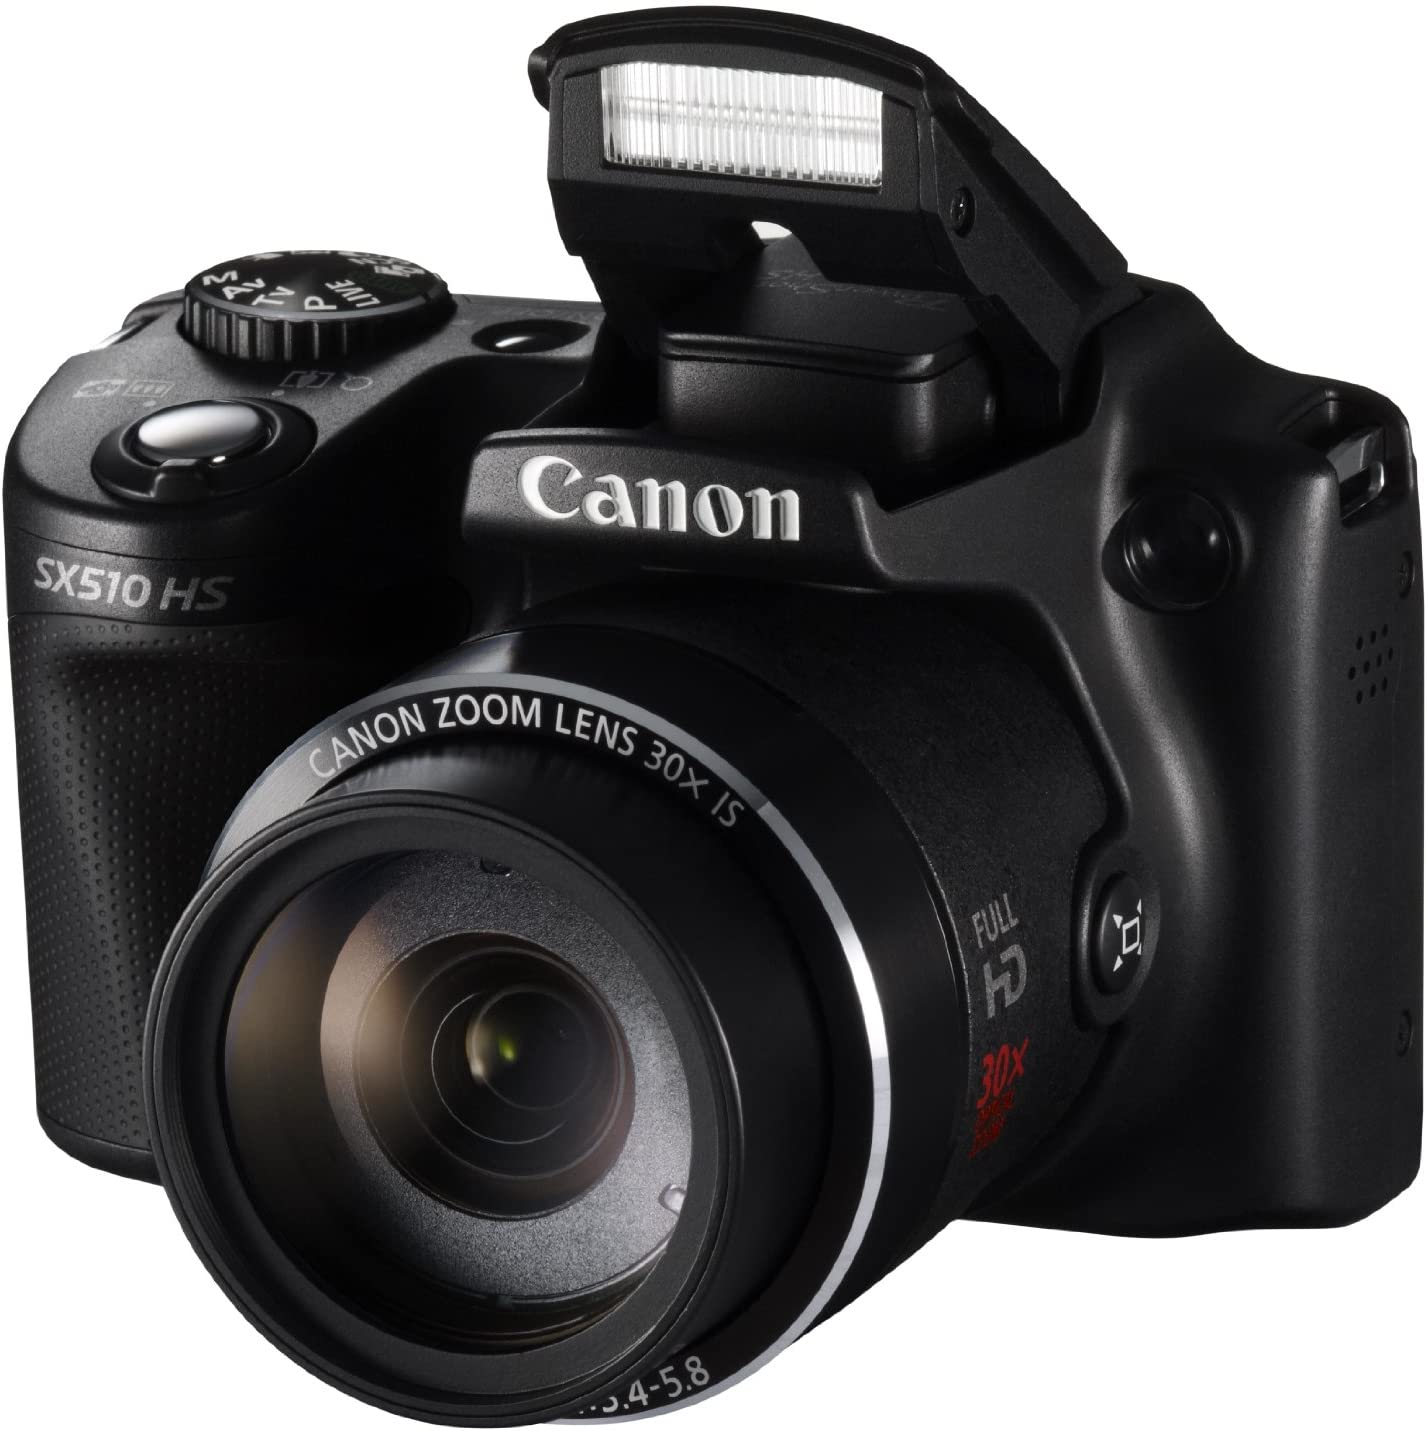 Canon PowerShot SX510 HS Camera